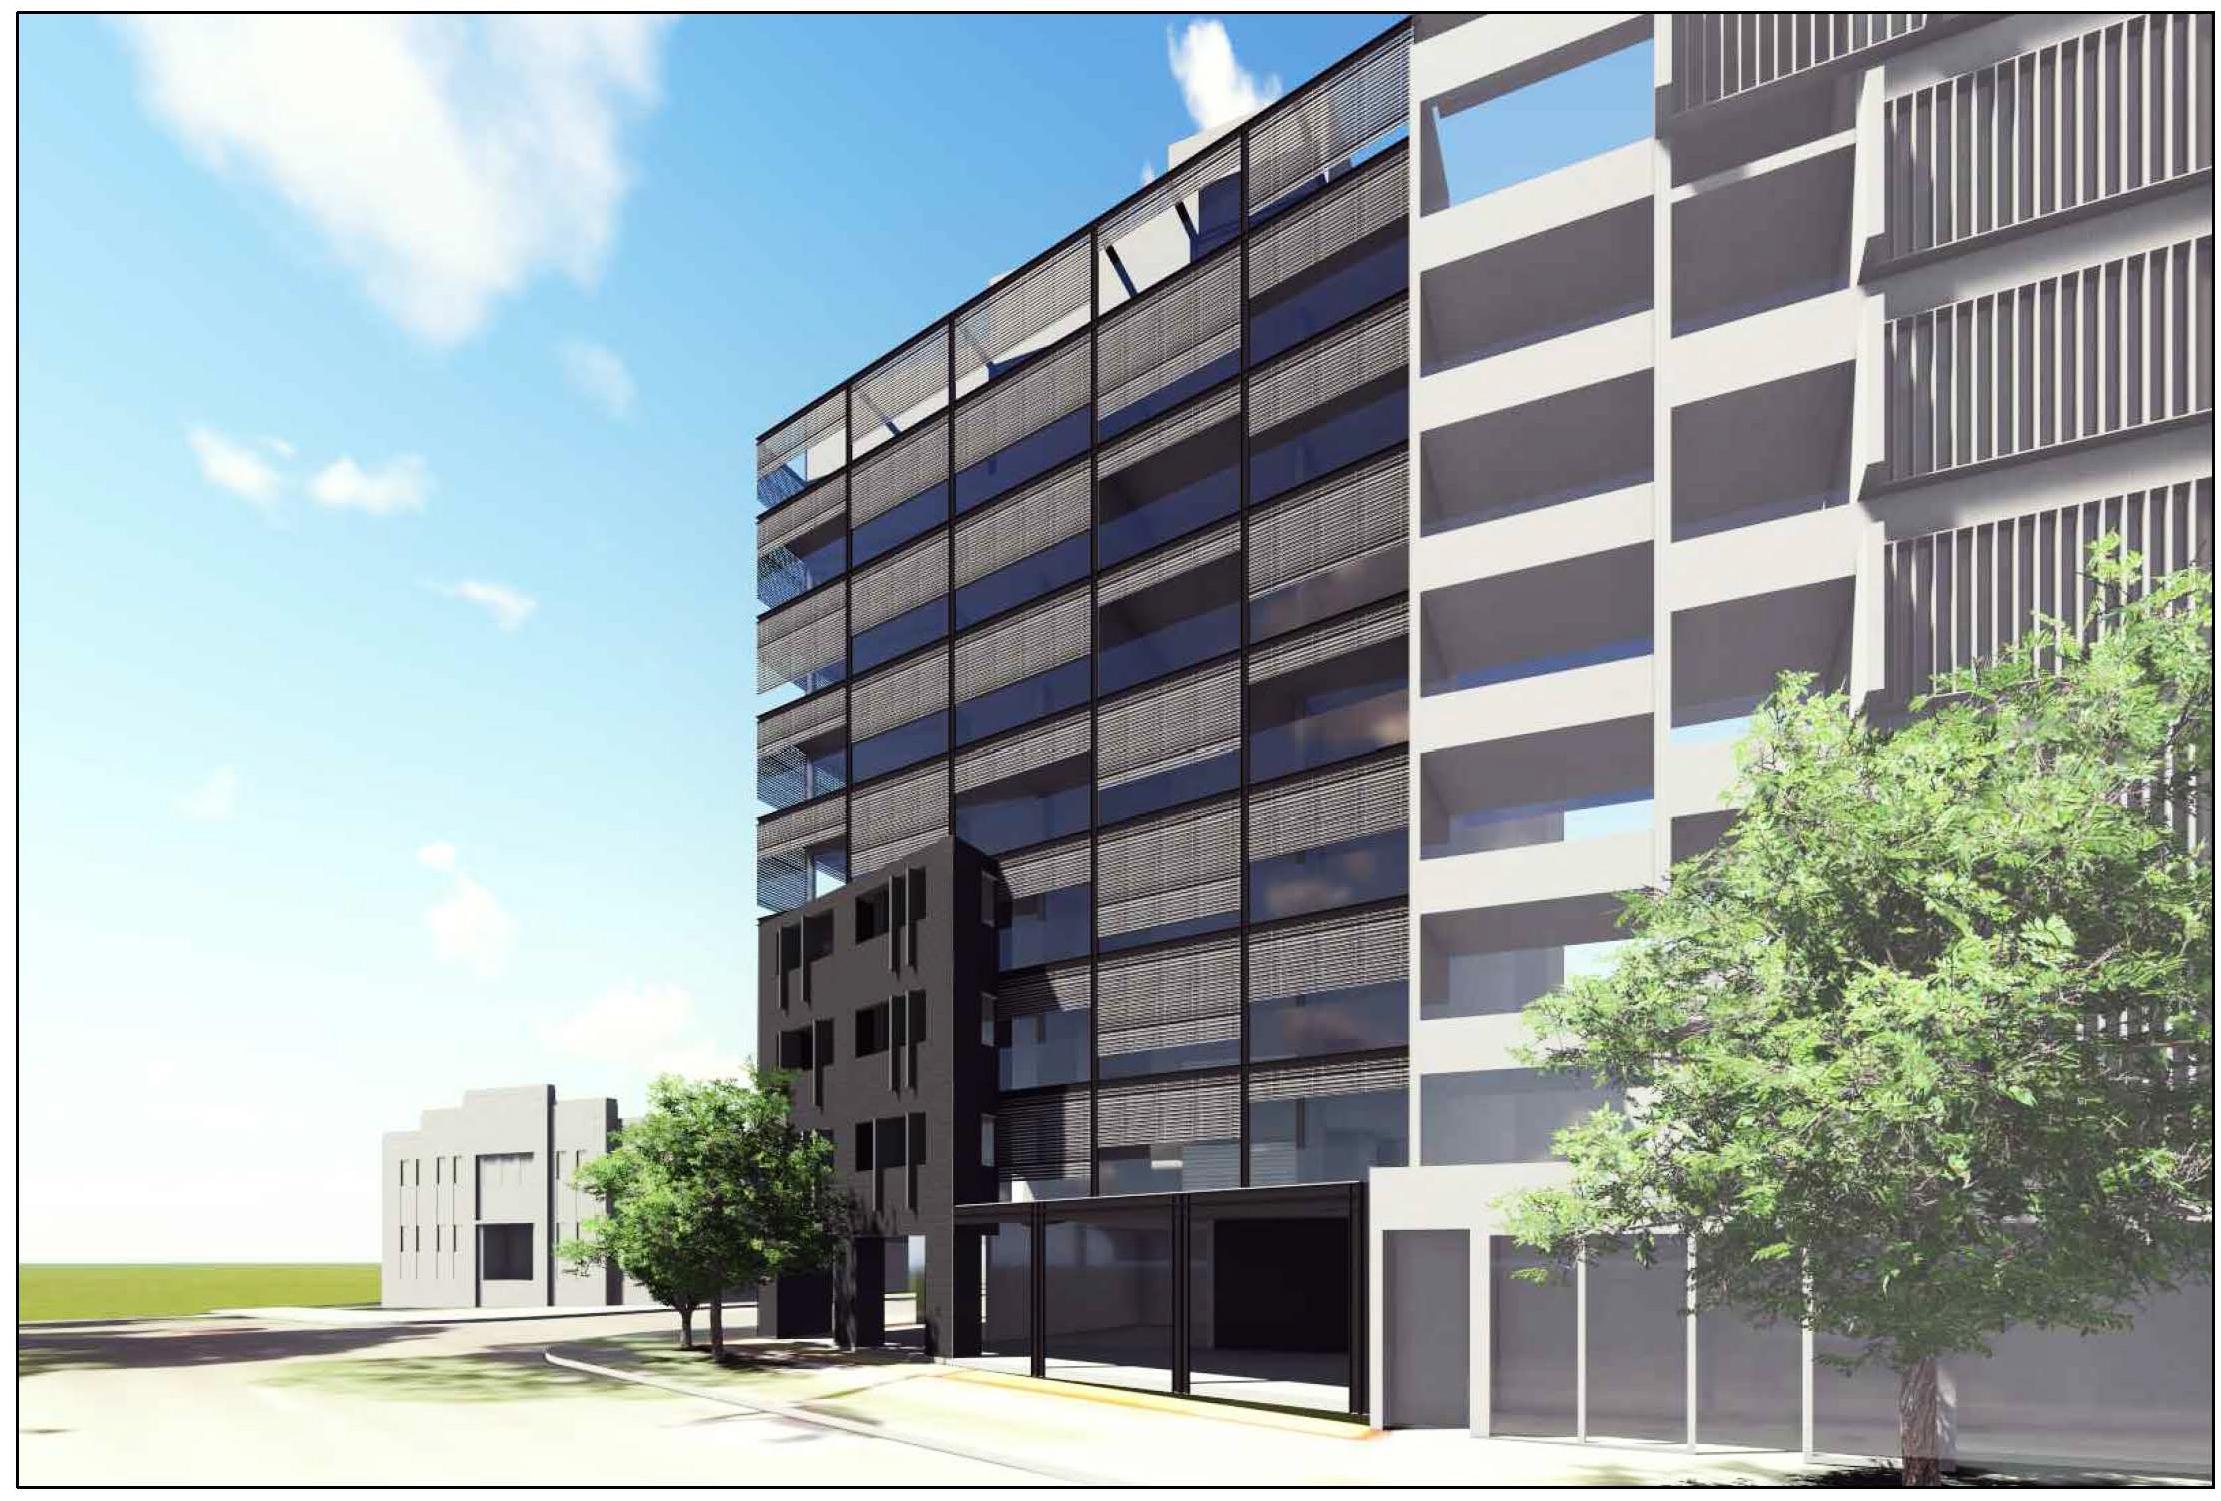 charles_tang_design_apartment_and_retail_mixed_use-sutherland 4